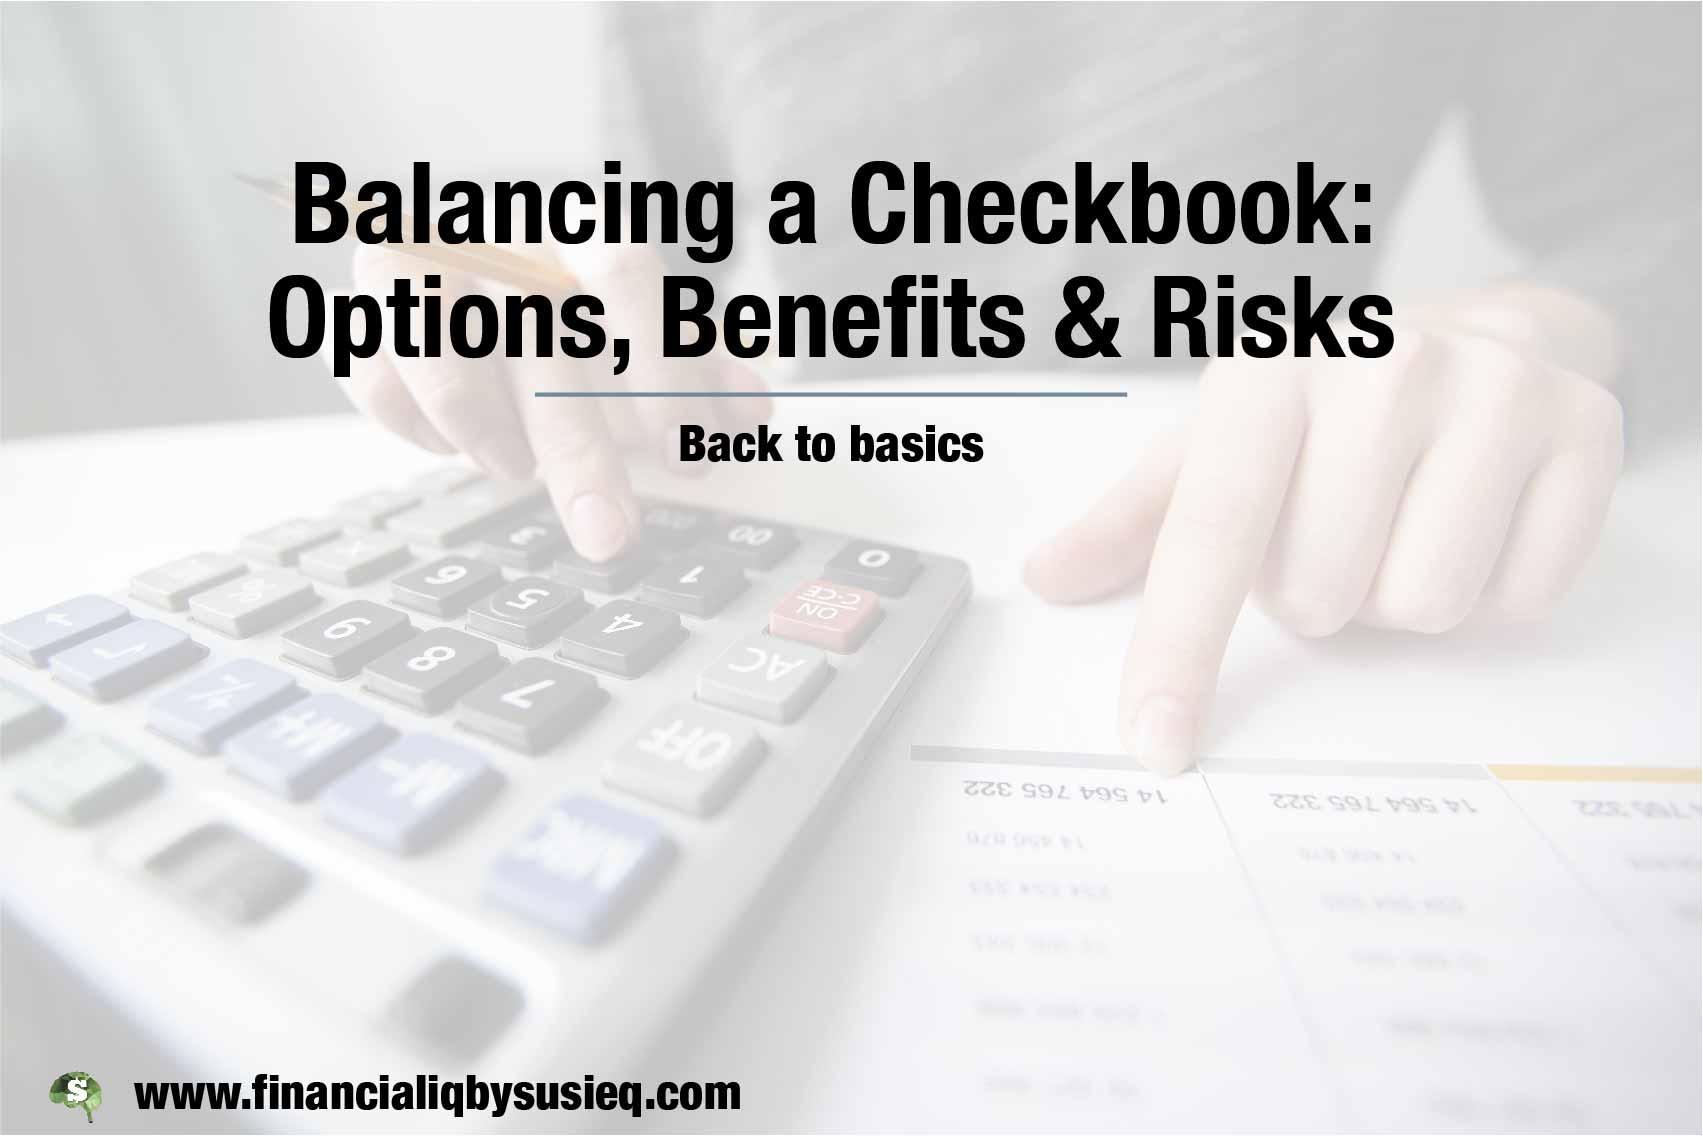 Balancing a Checkbook: Benefits and Risks